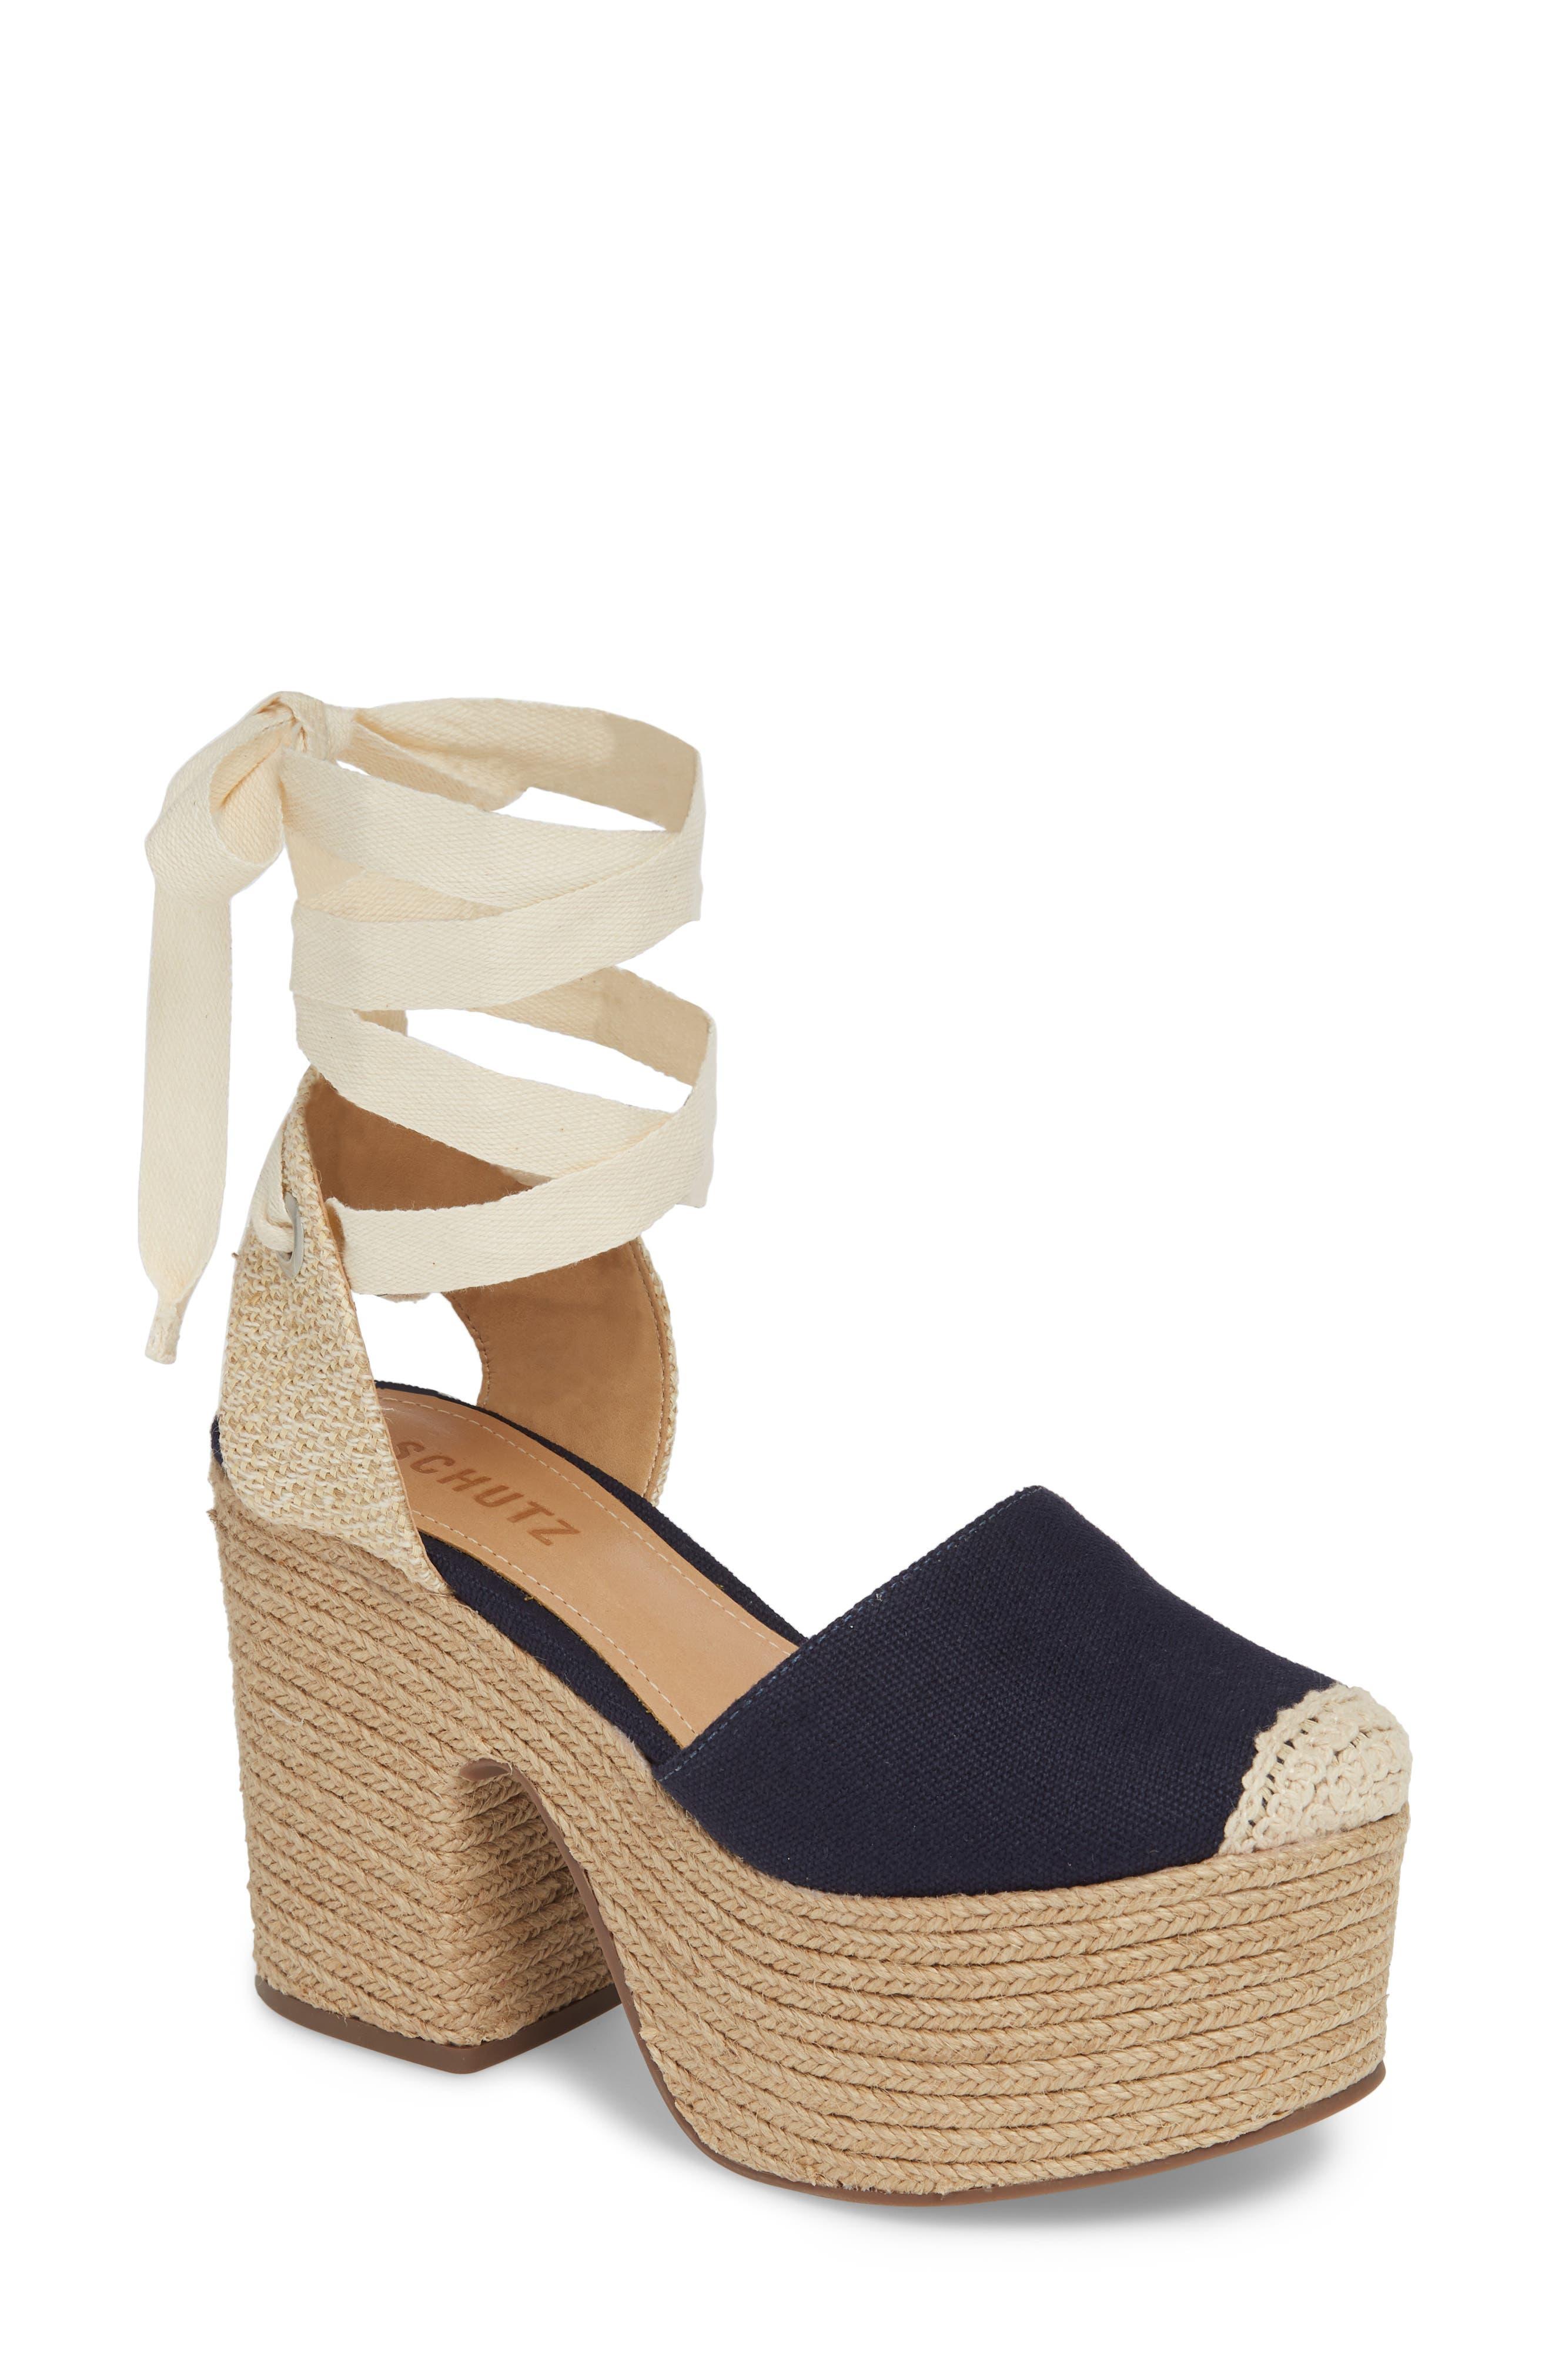 c43bc335981 Women s Blue Sandals by British Designers